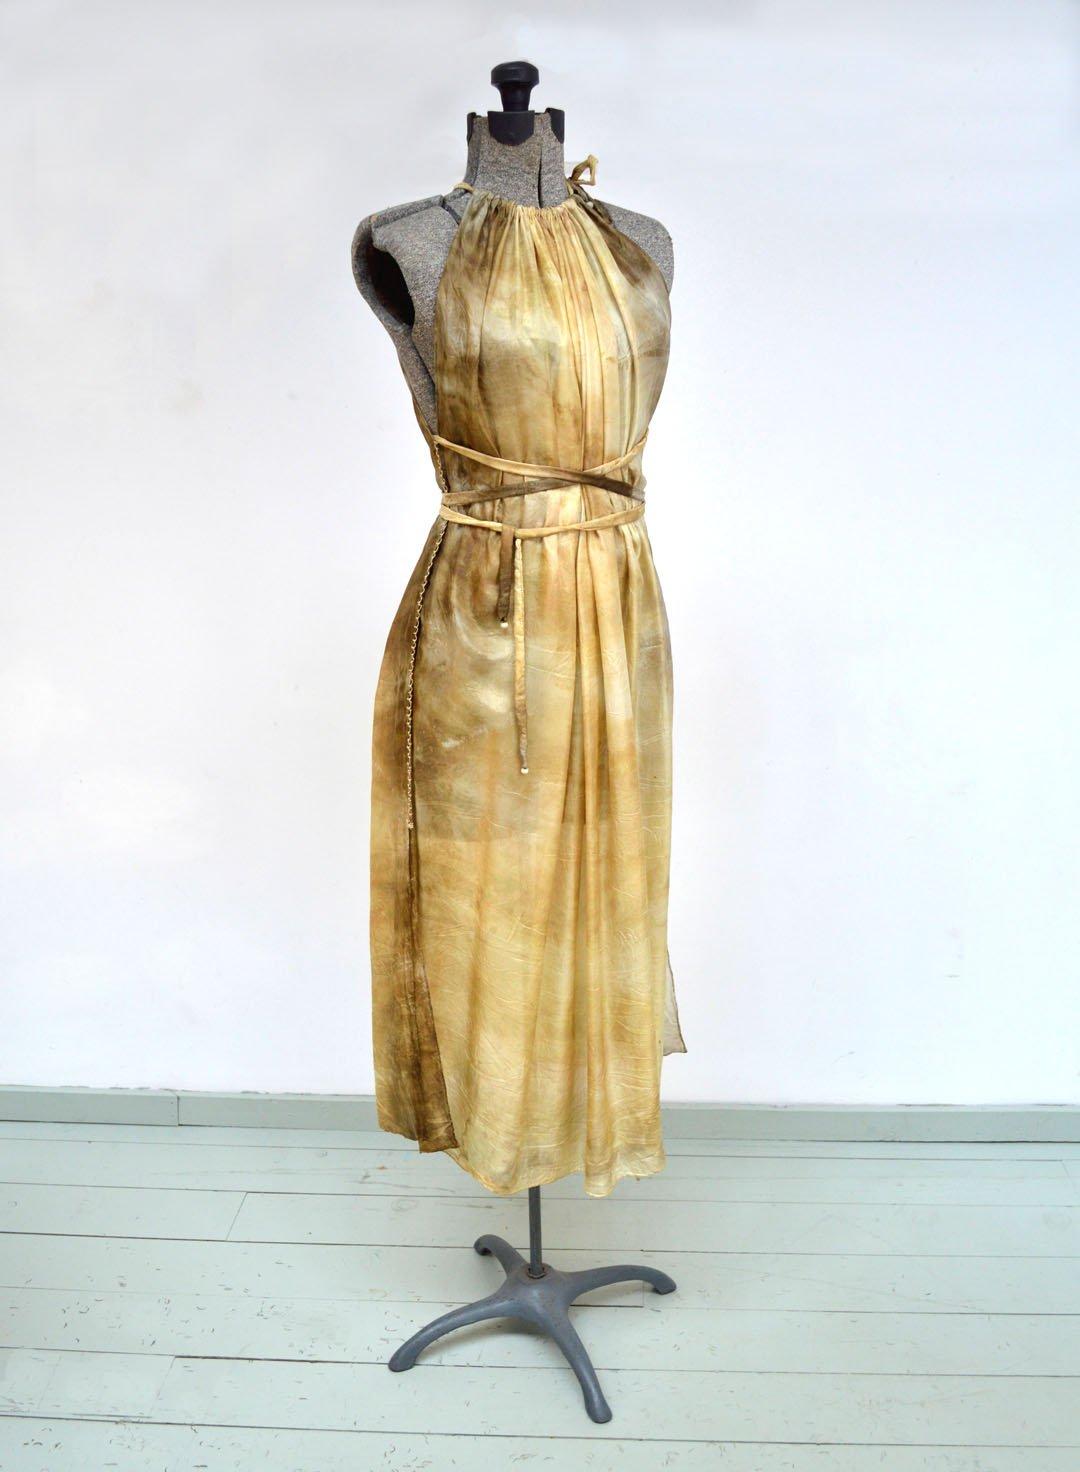 Image of Rustic gold Artemis dress